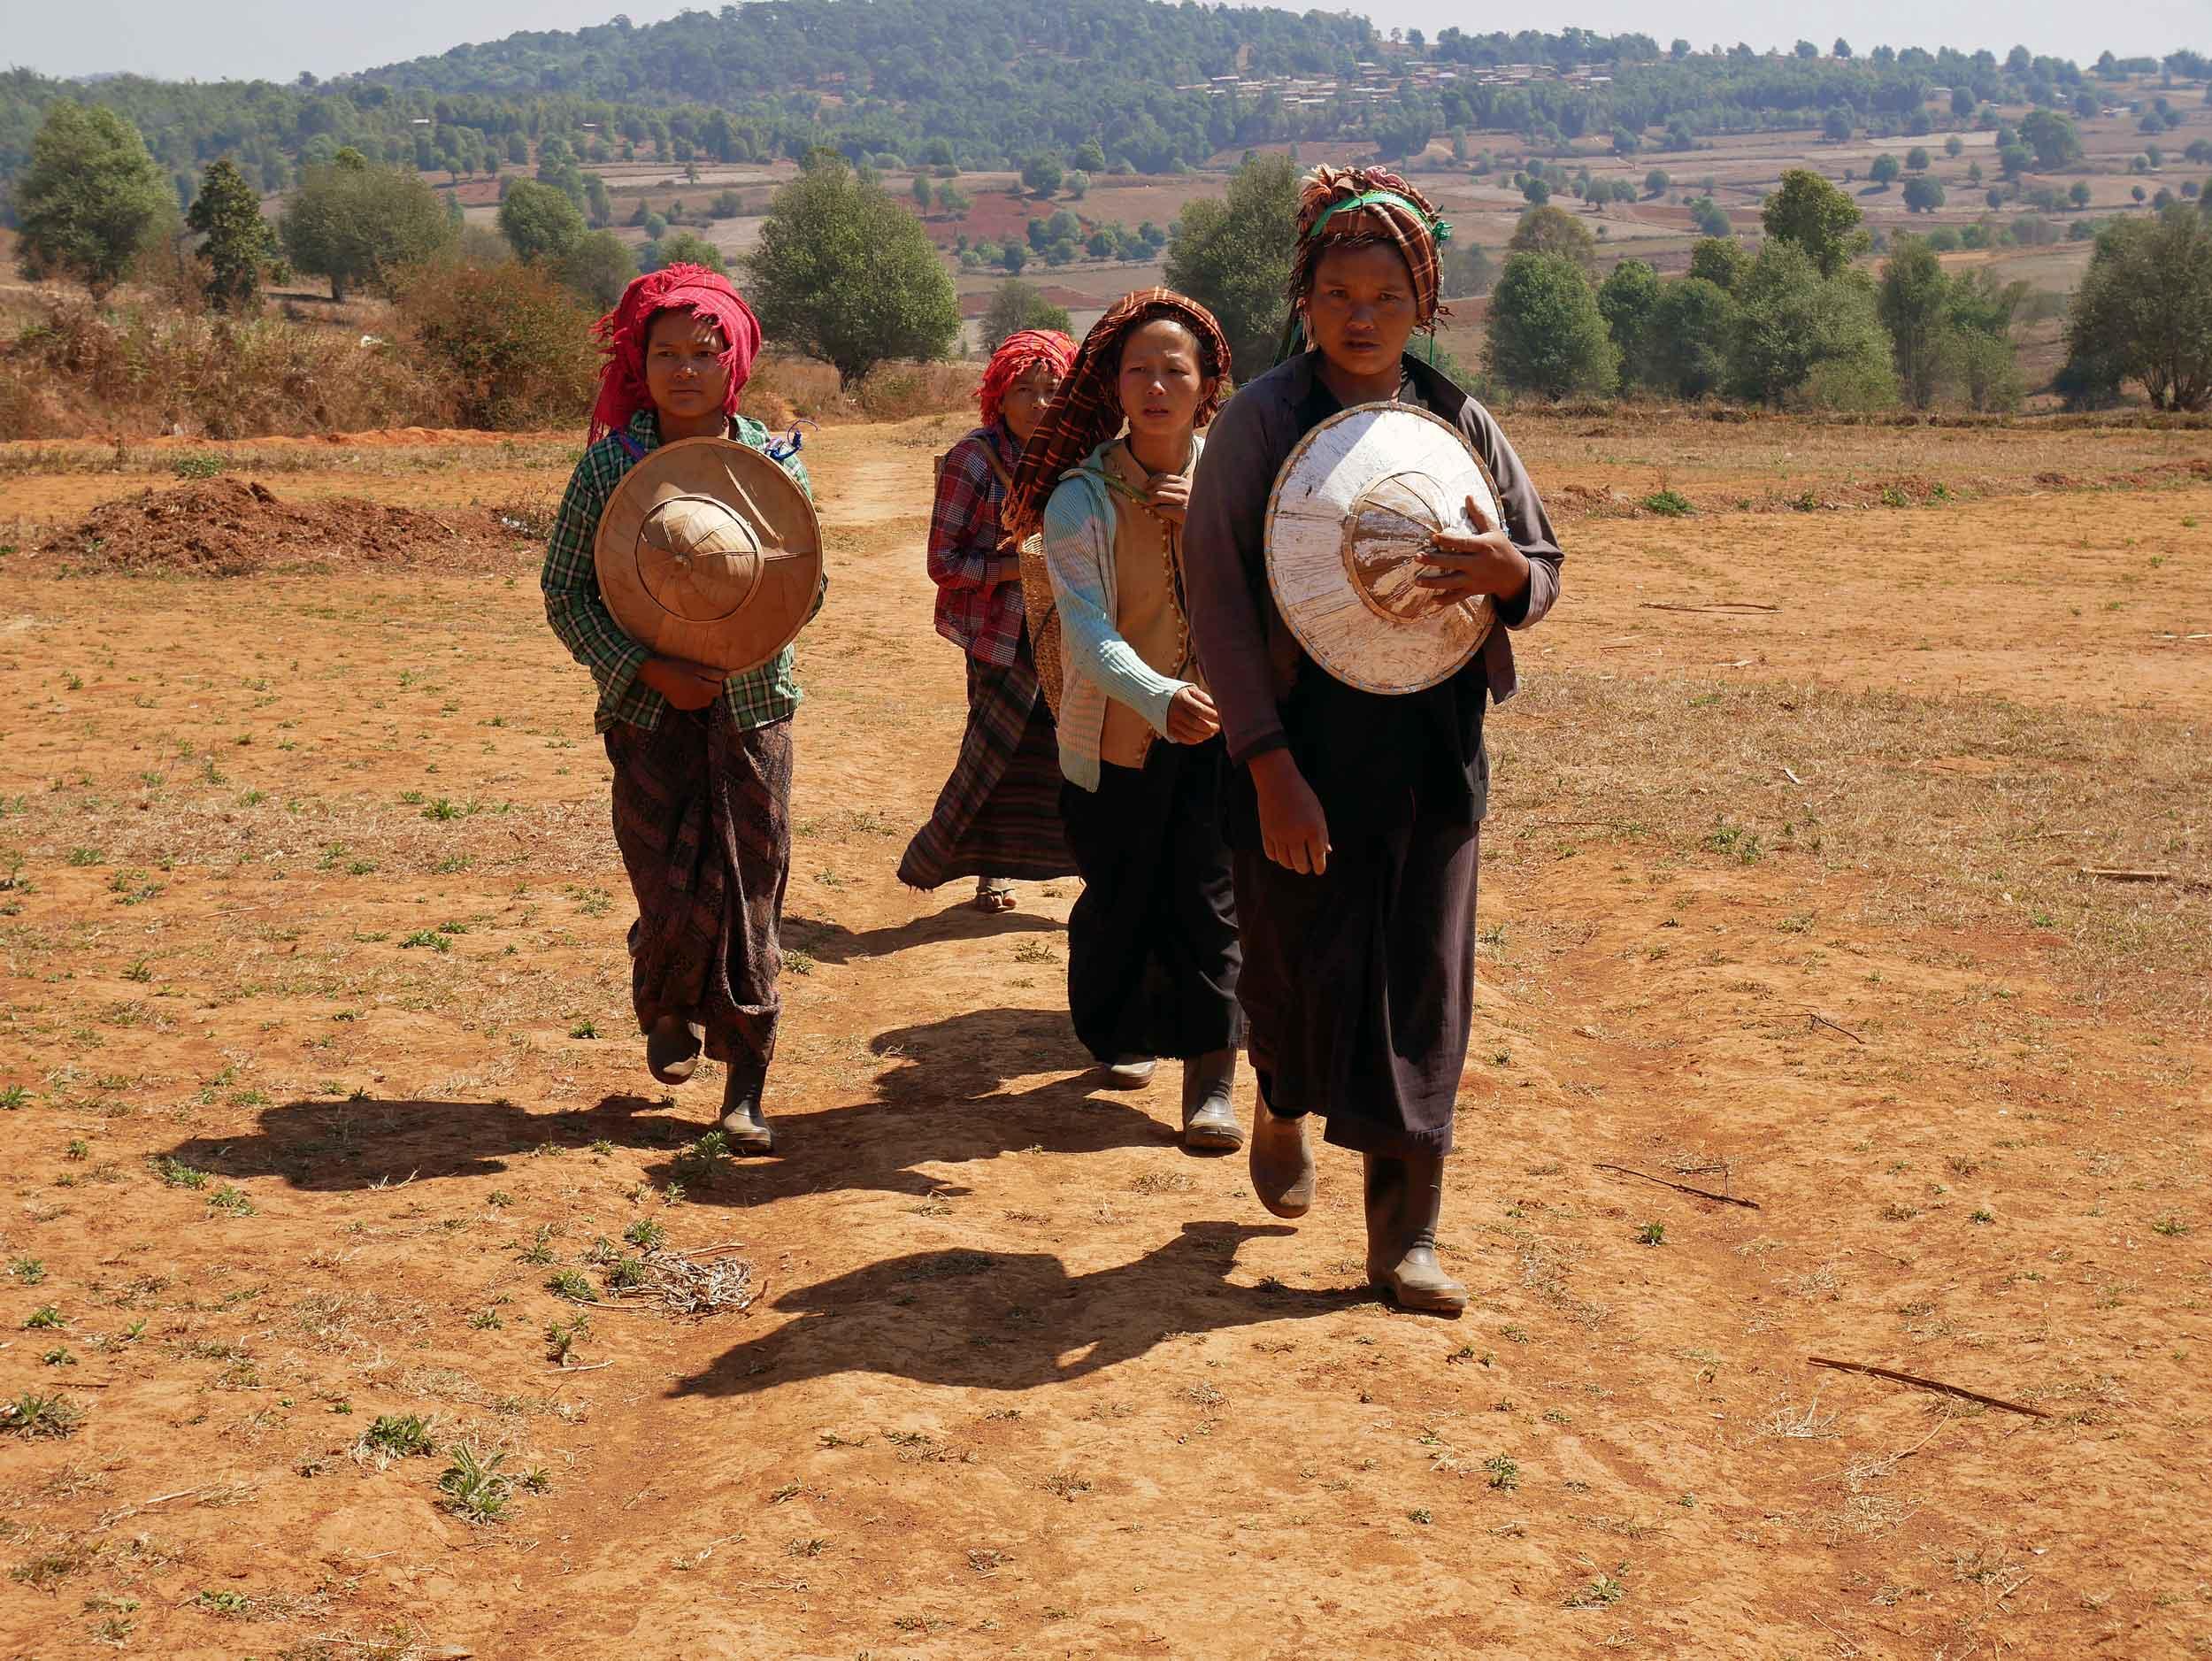 Women returning from the field work (Feb 20).